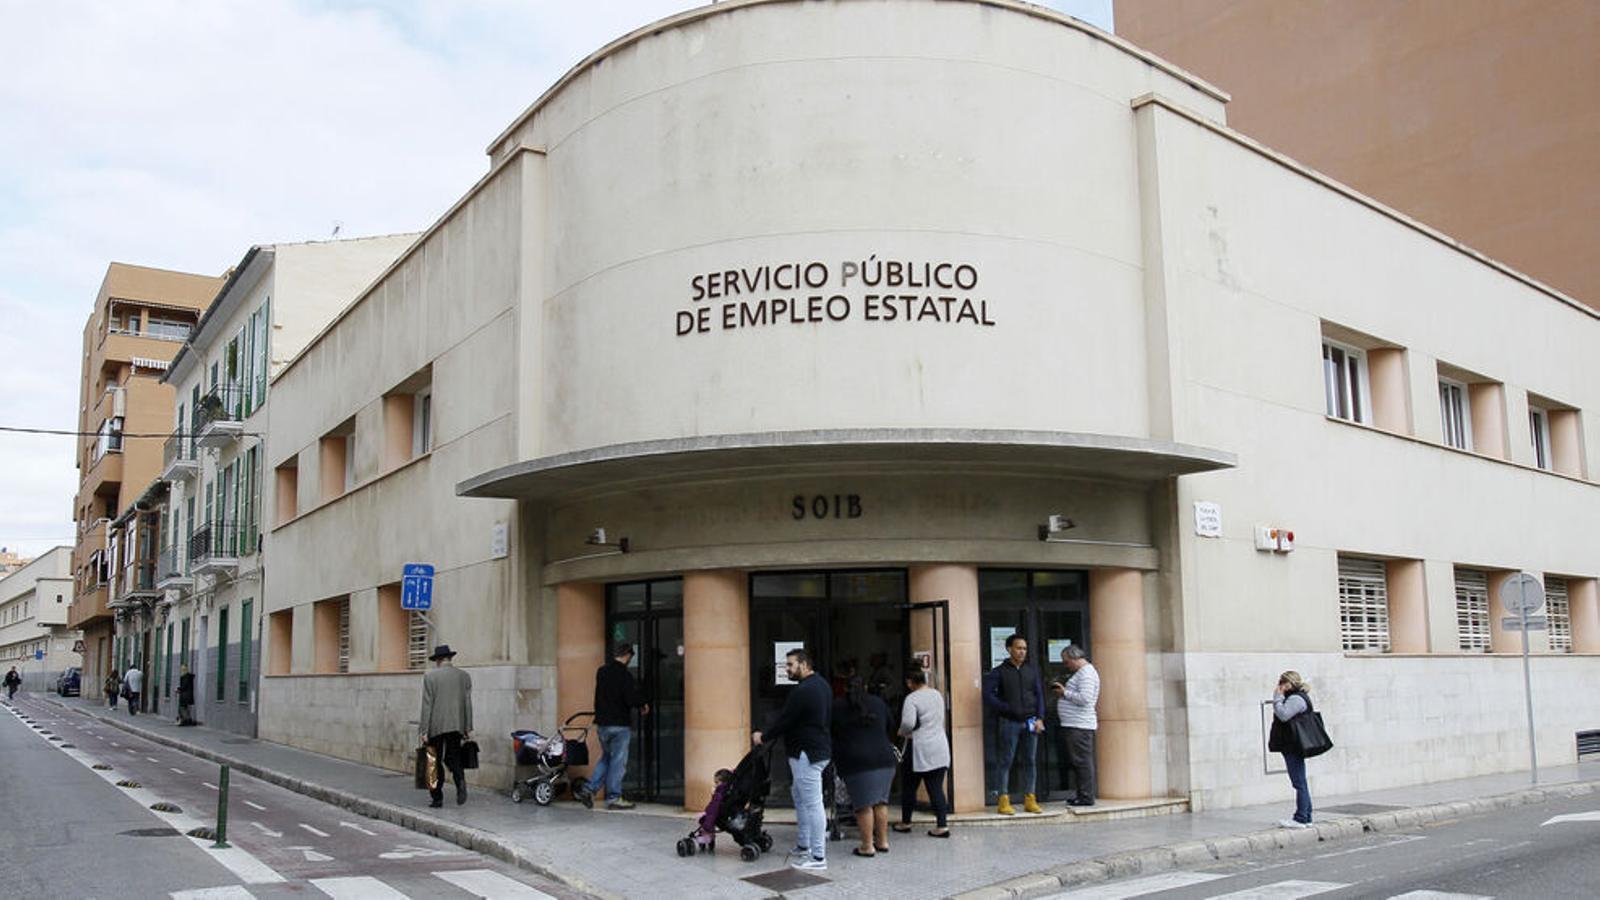 Oficina del SOIB a Palma